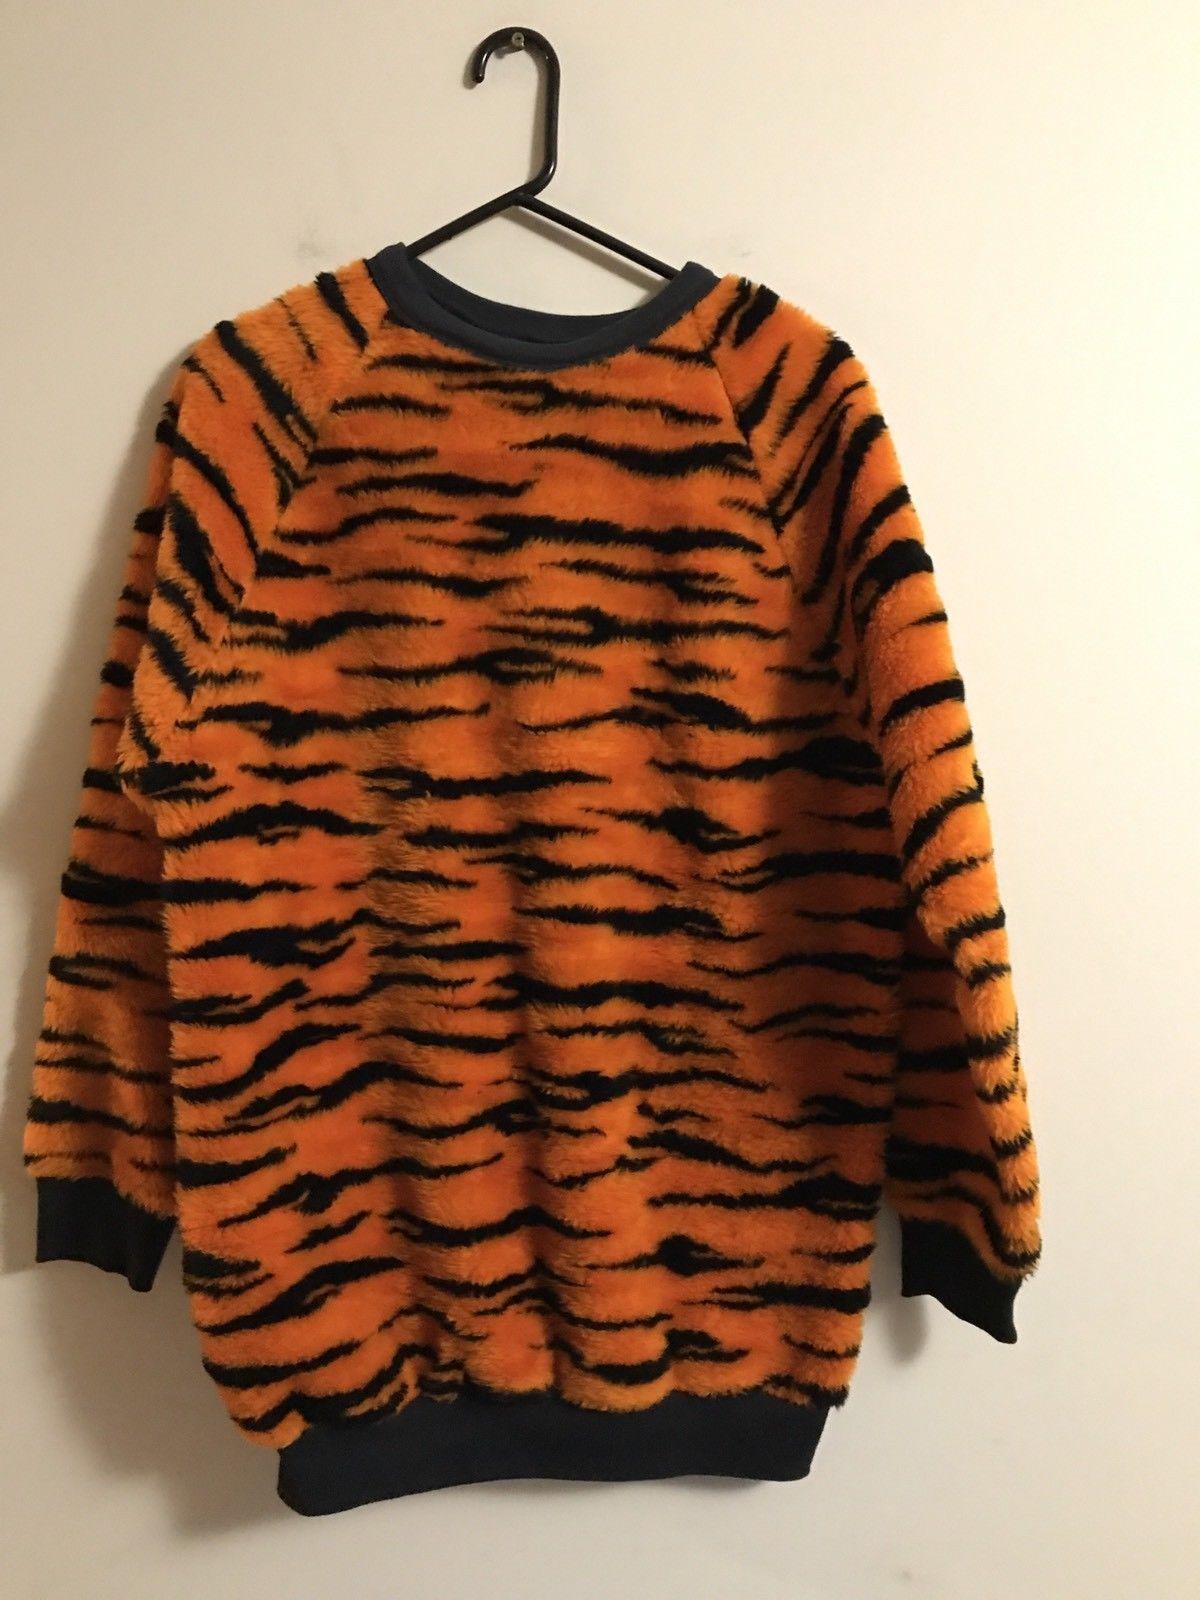 Vintage Bengal Tiger Striped Sweater Sweatshirt Size Xl Costume Heavy Cat